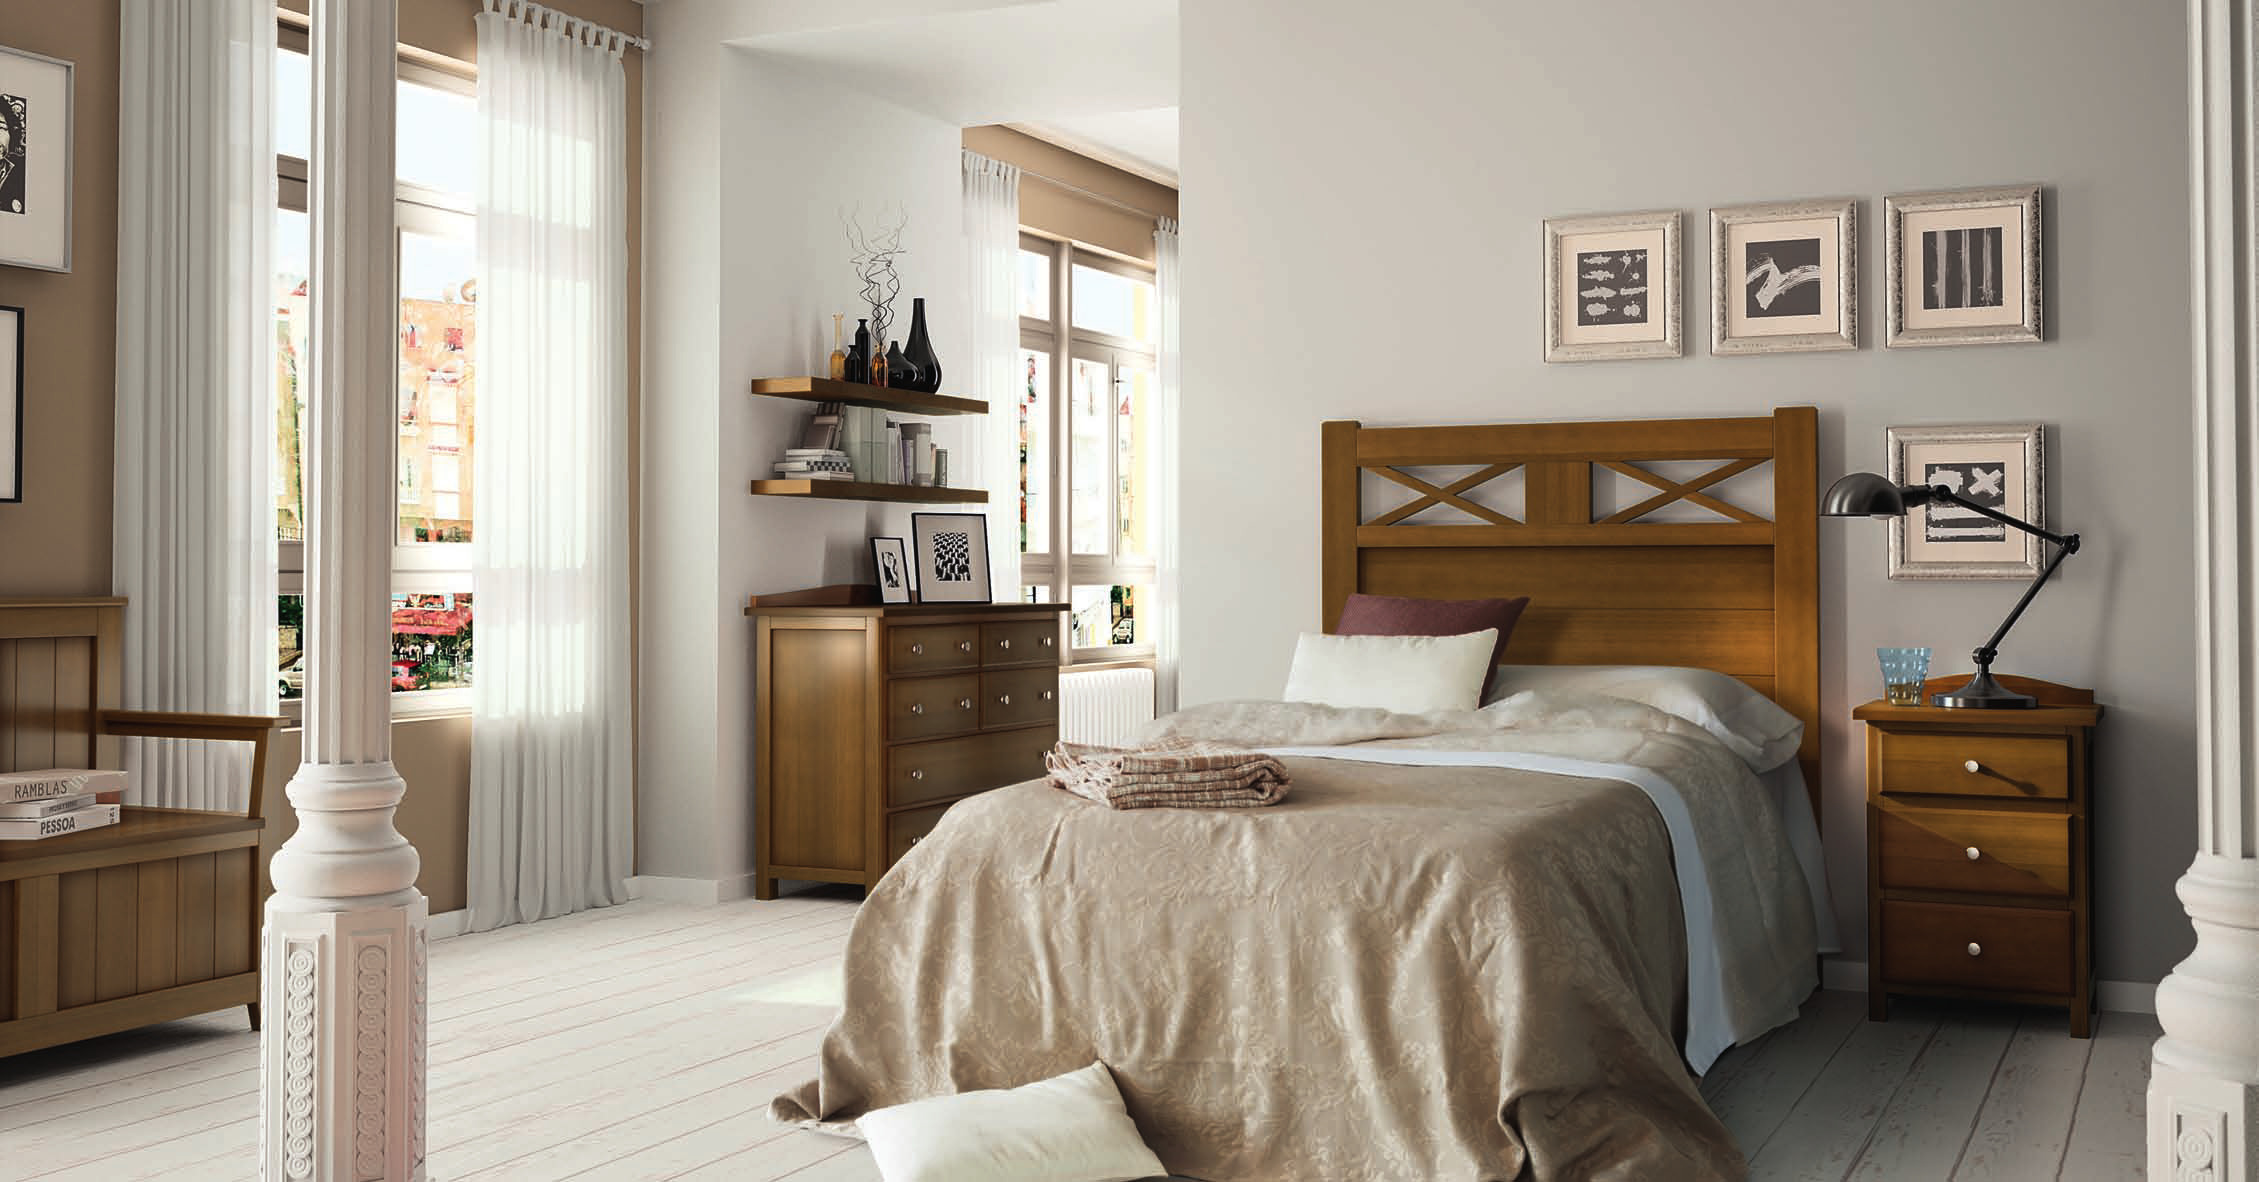 416-dormitorio-j-33